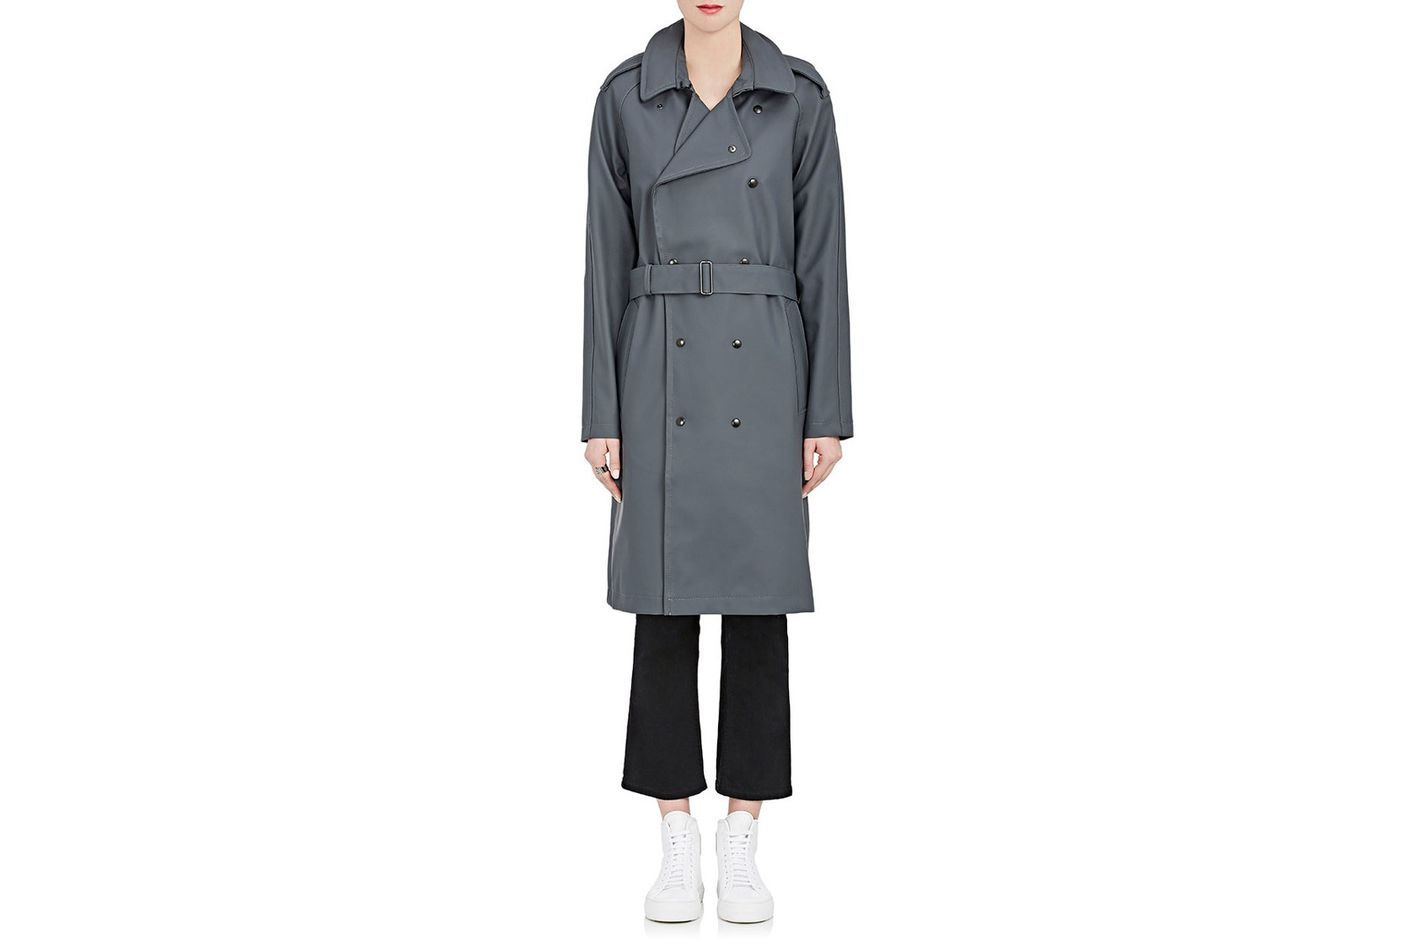 Stutterheim Raincoats Ture Trench Raincoat